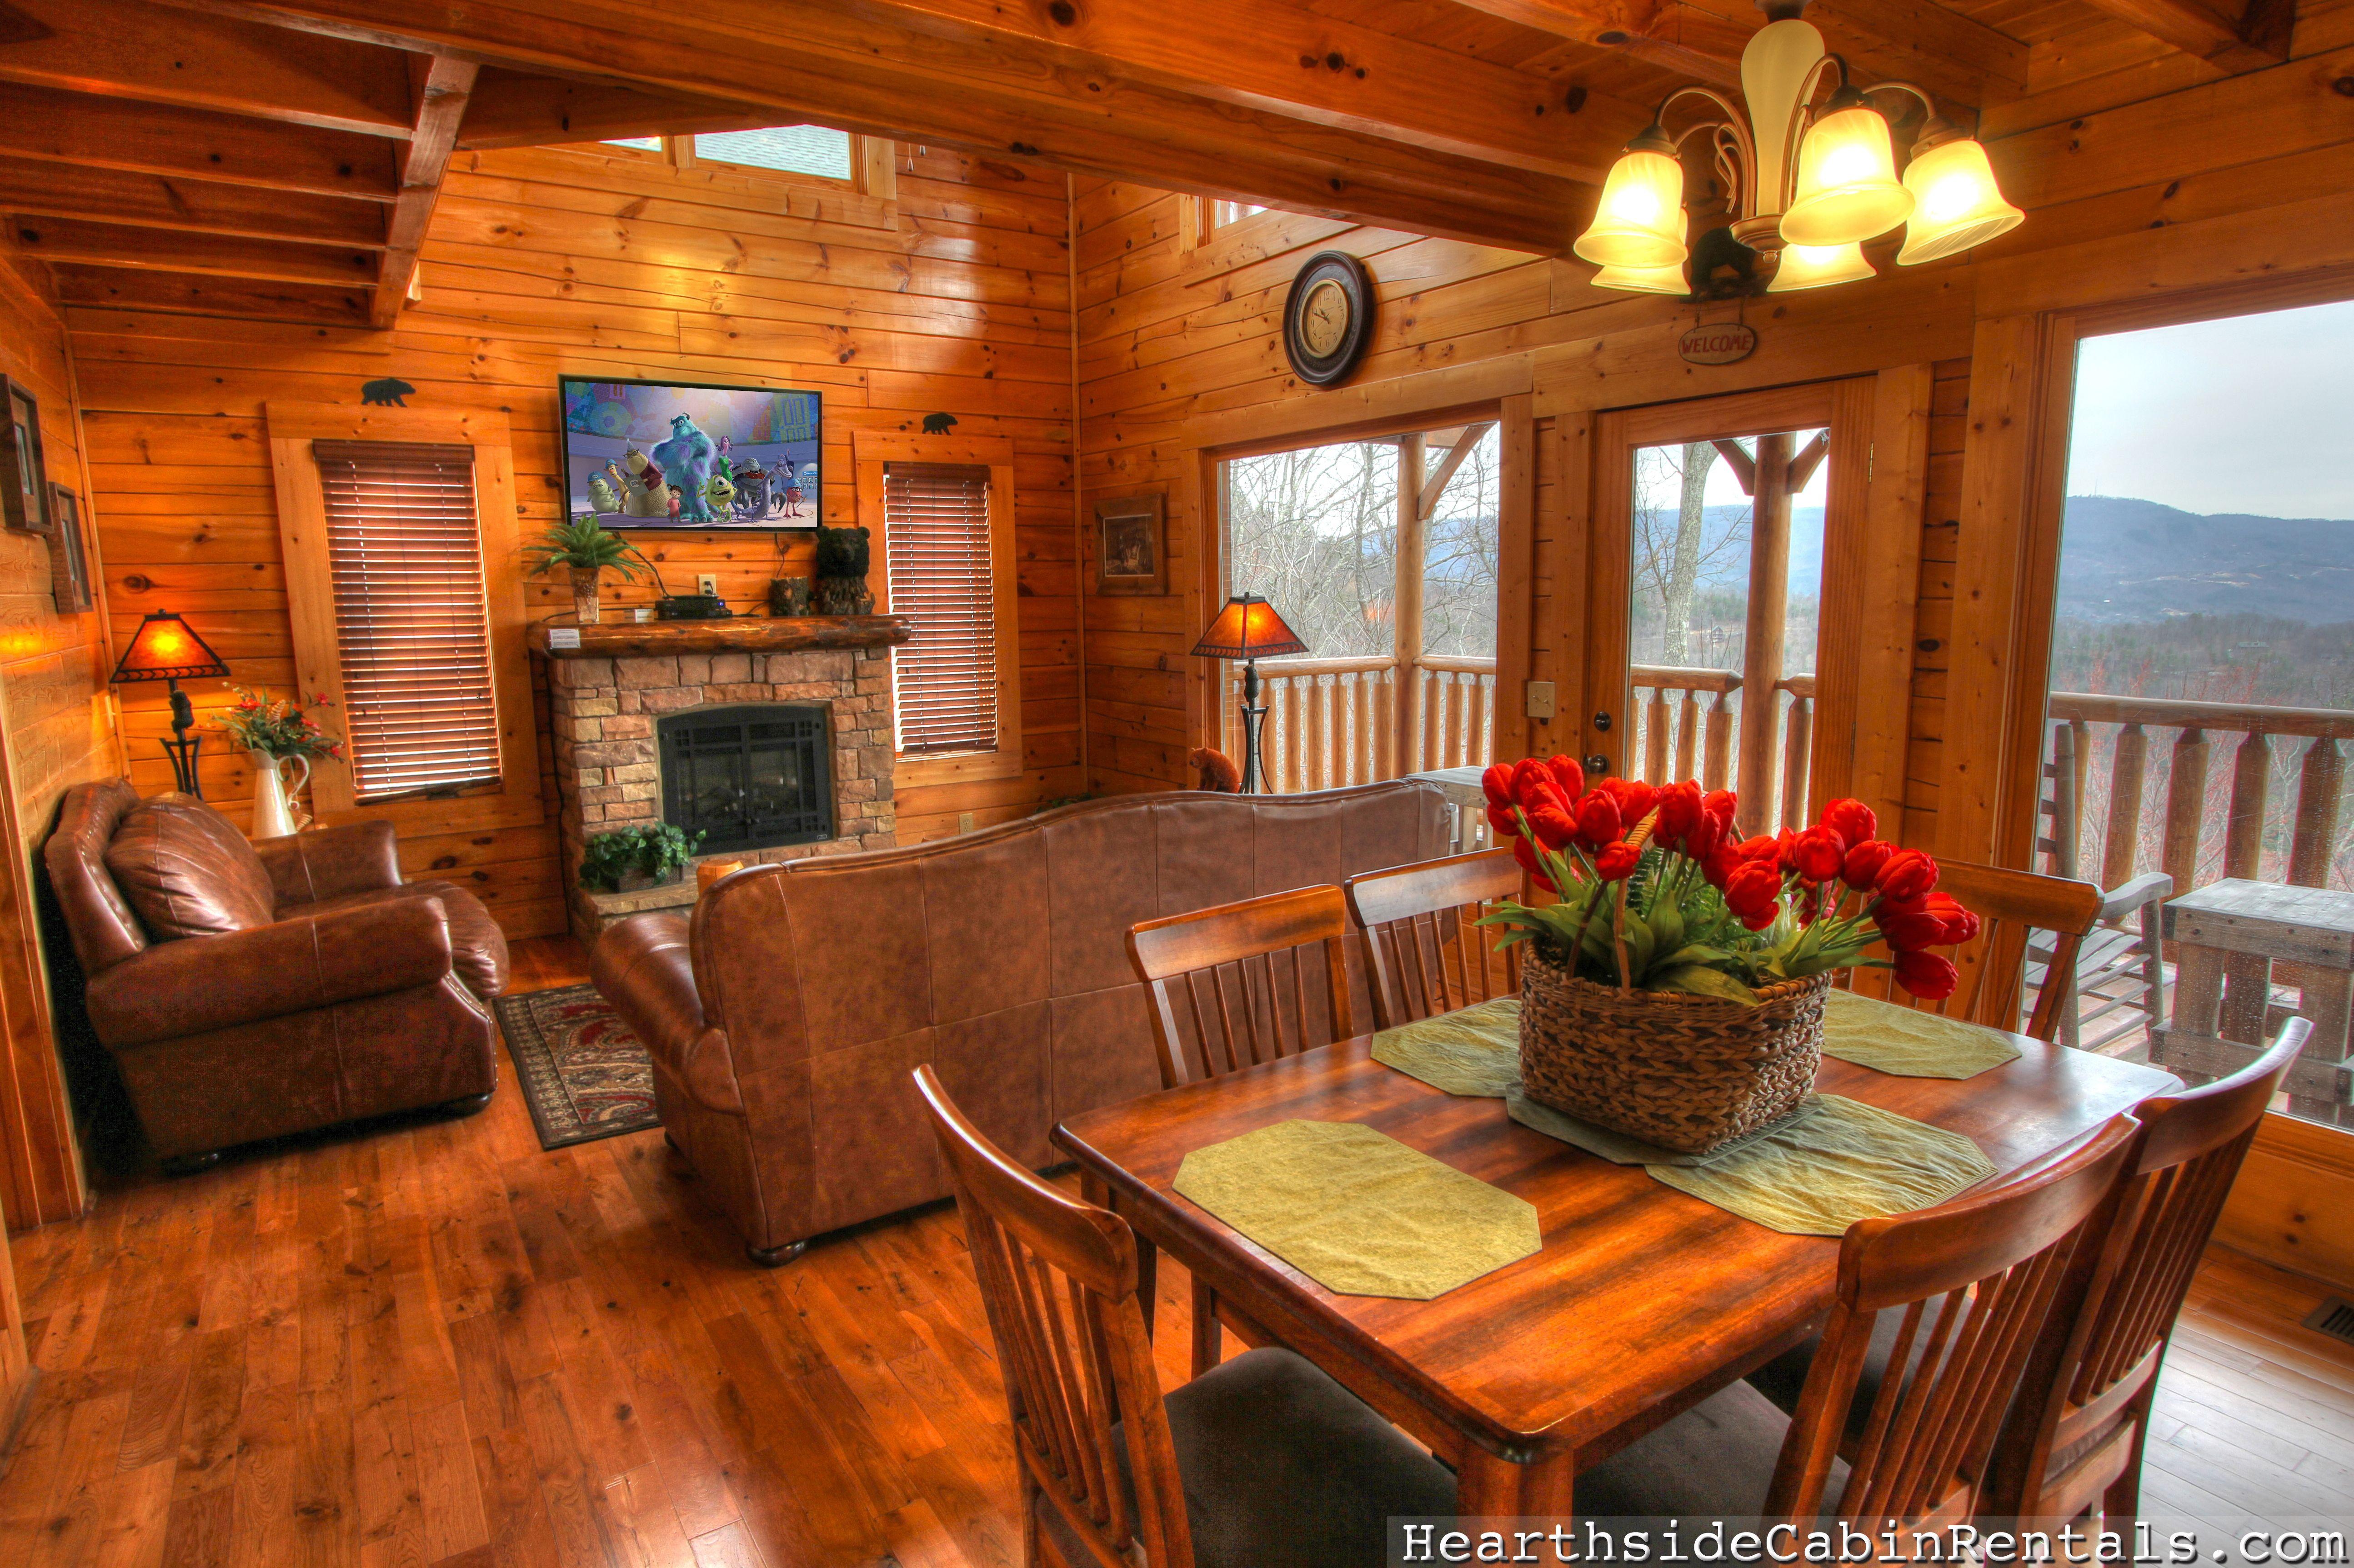 HEAVENLY INSPIRED 1 BEDROOM cabin in Sevierville